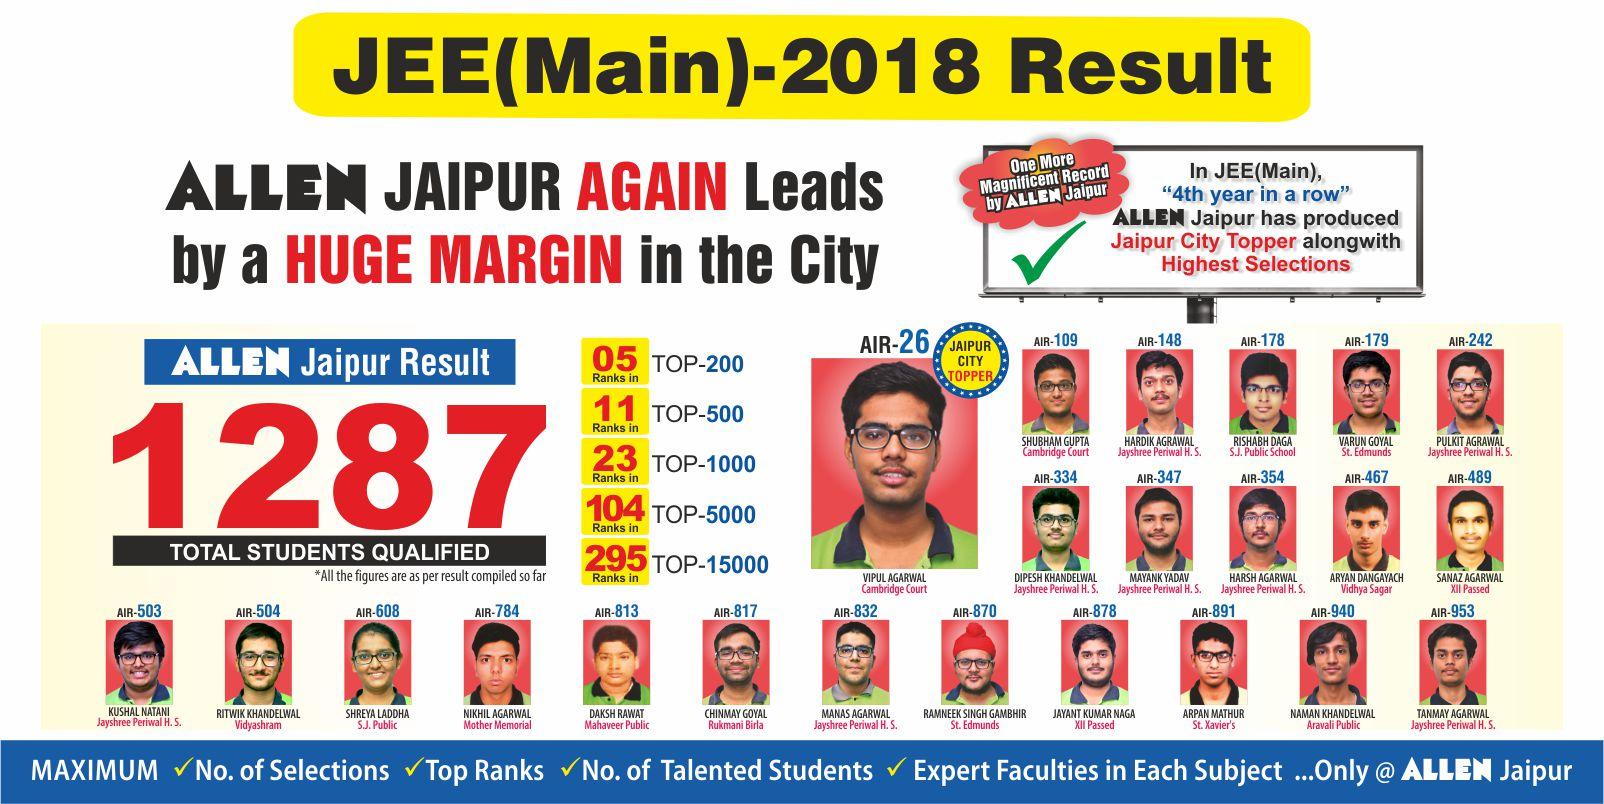 ALLEN Jaipur JEE (Main) 2018